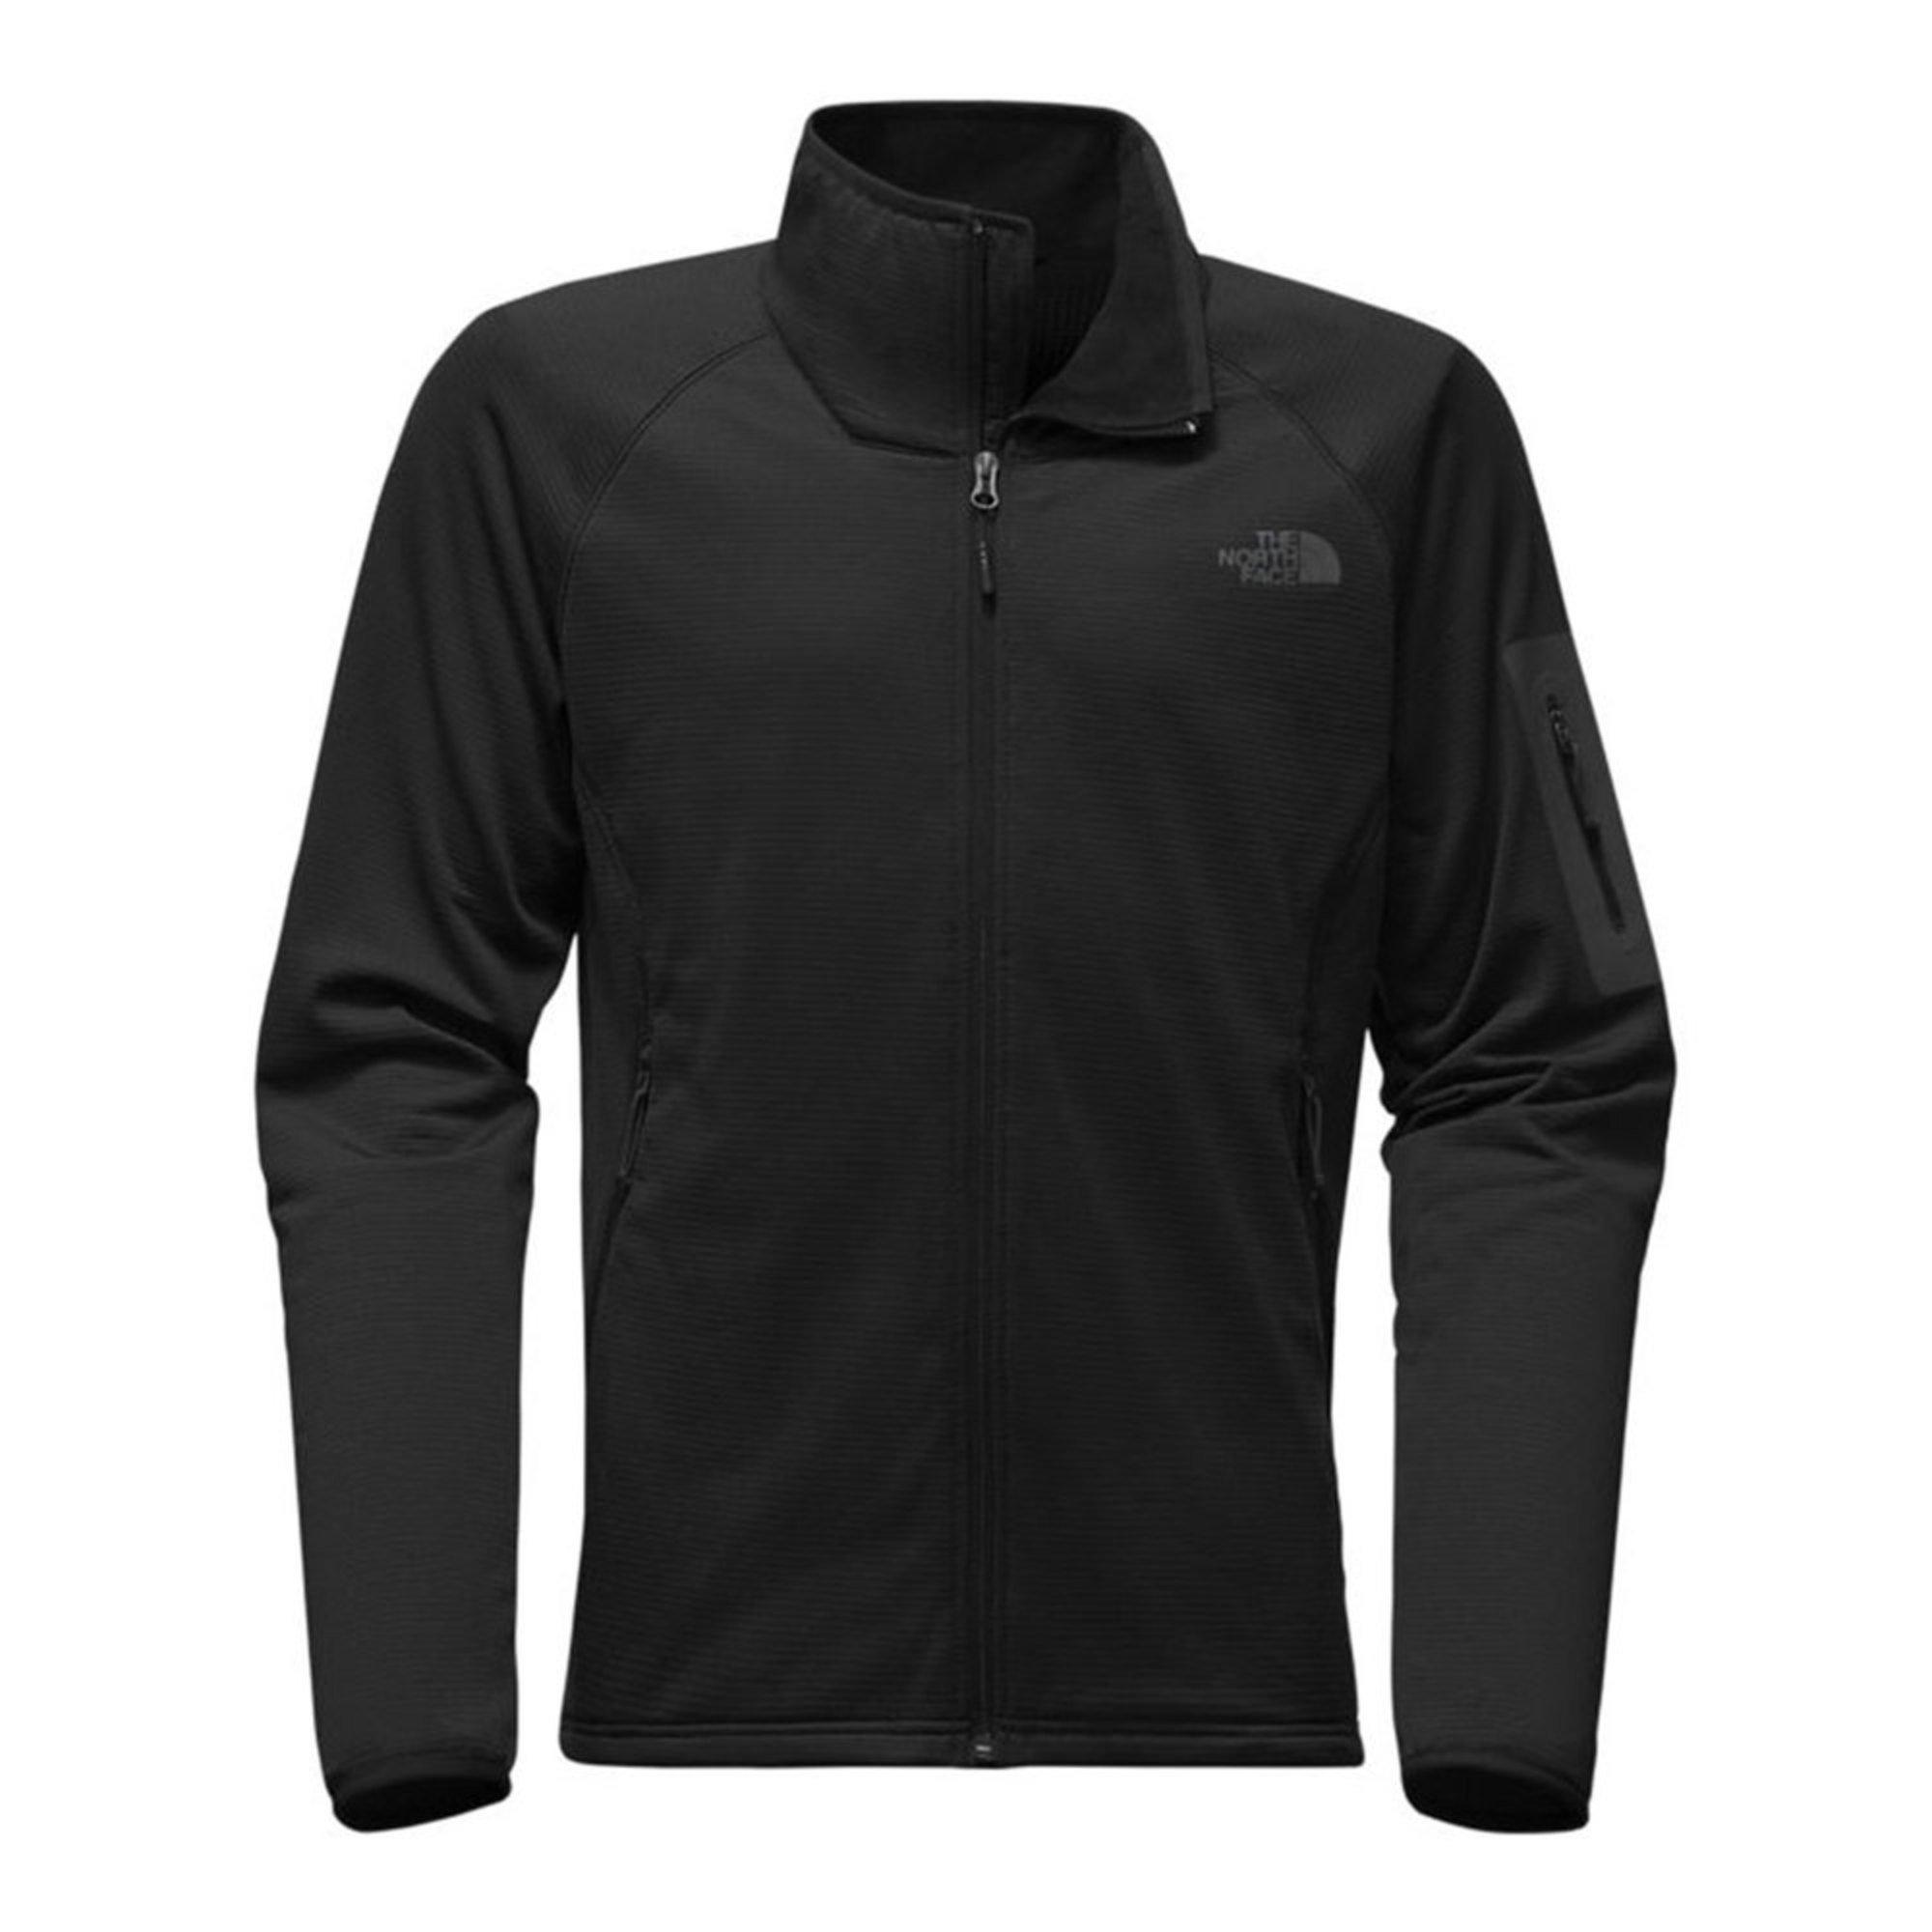 66e034a9f The North Face Men's Borod Grided Fleece Full Zip Jacket